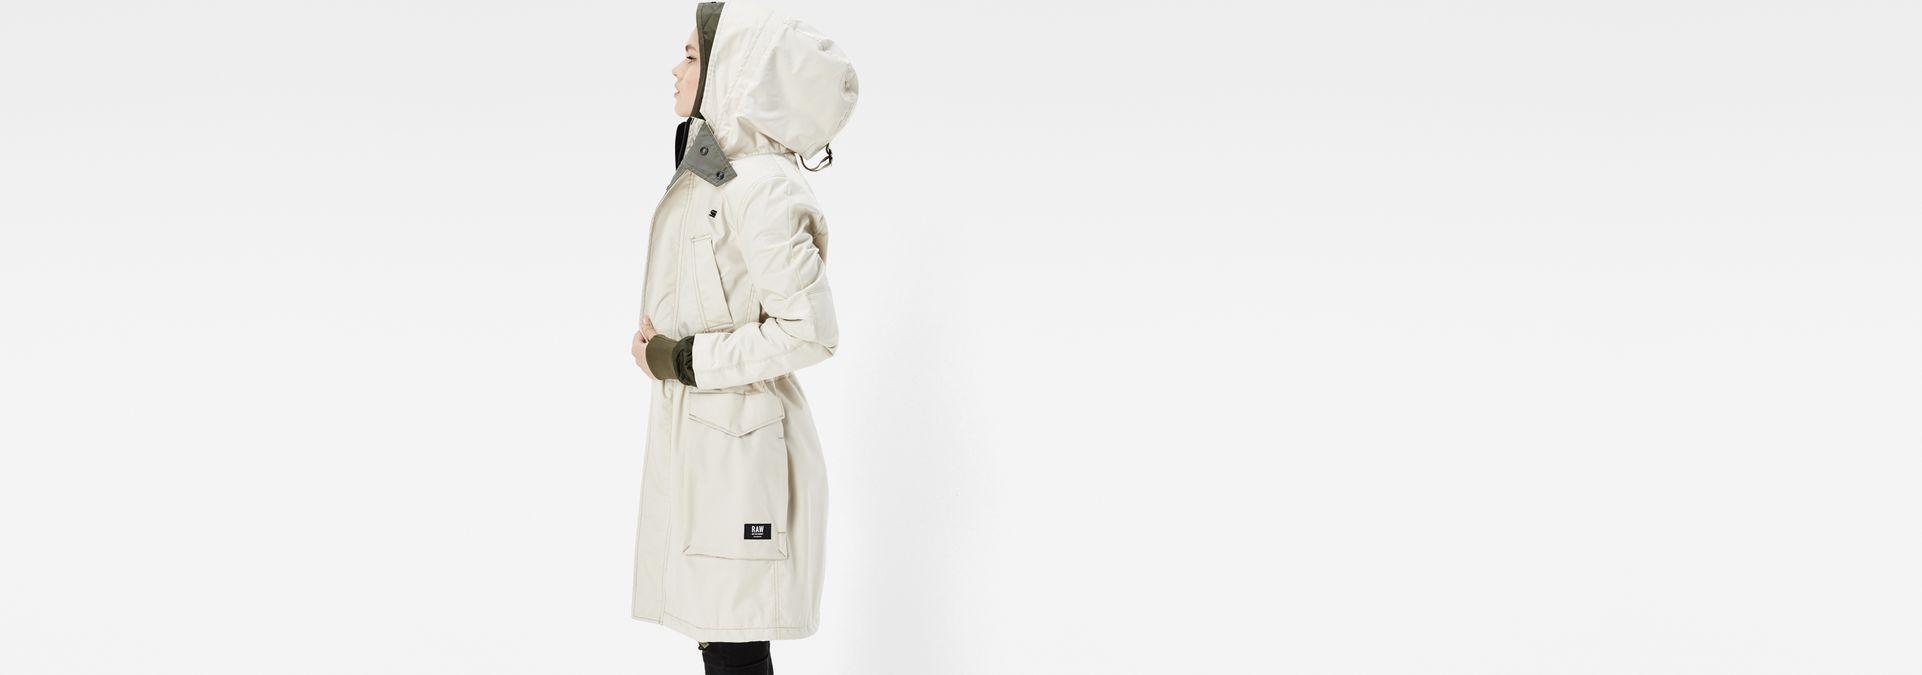 expedic parka whitebait whitebait women sale g star raw. Black Bedroom Furniture Sets. Home Design Ideas